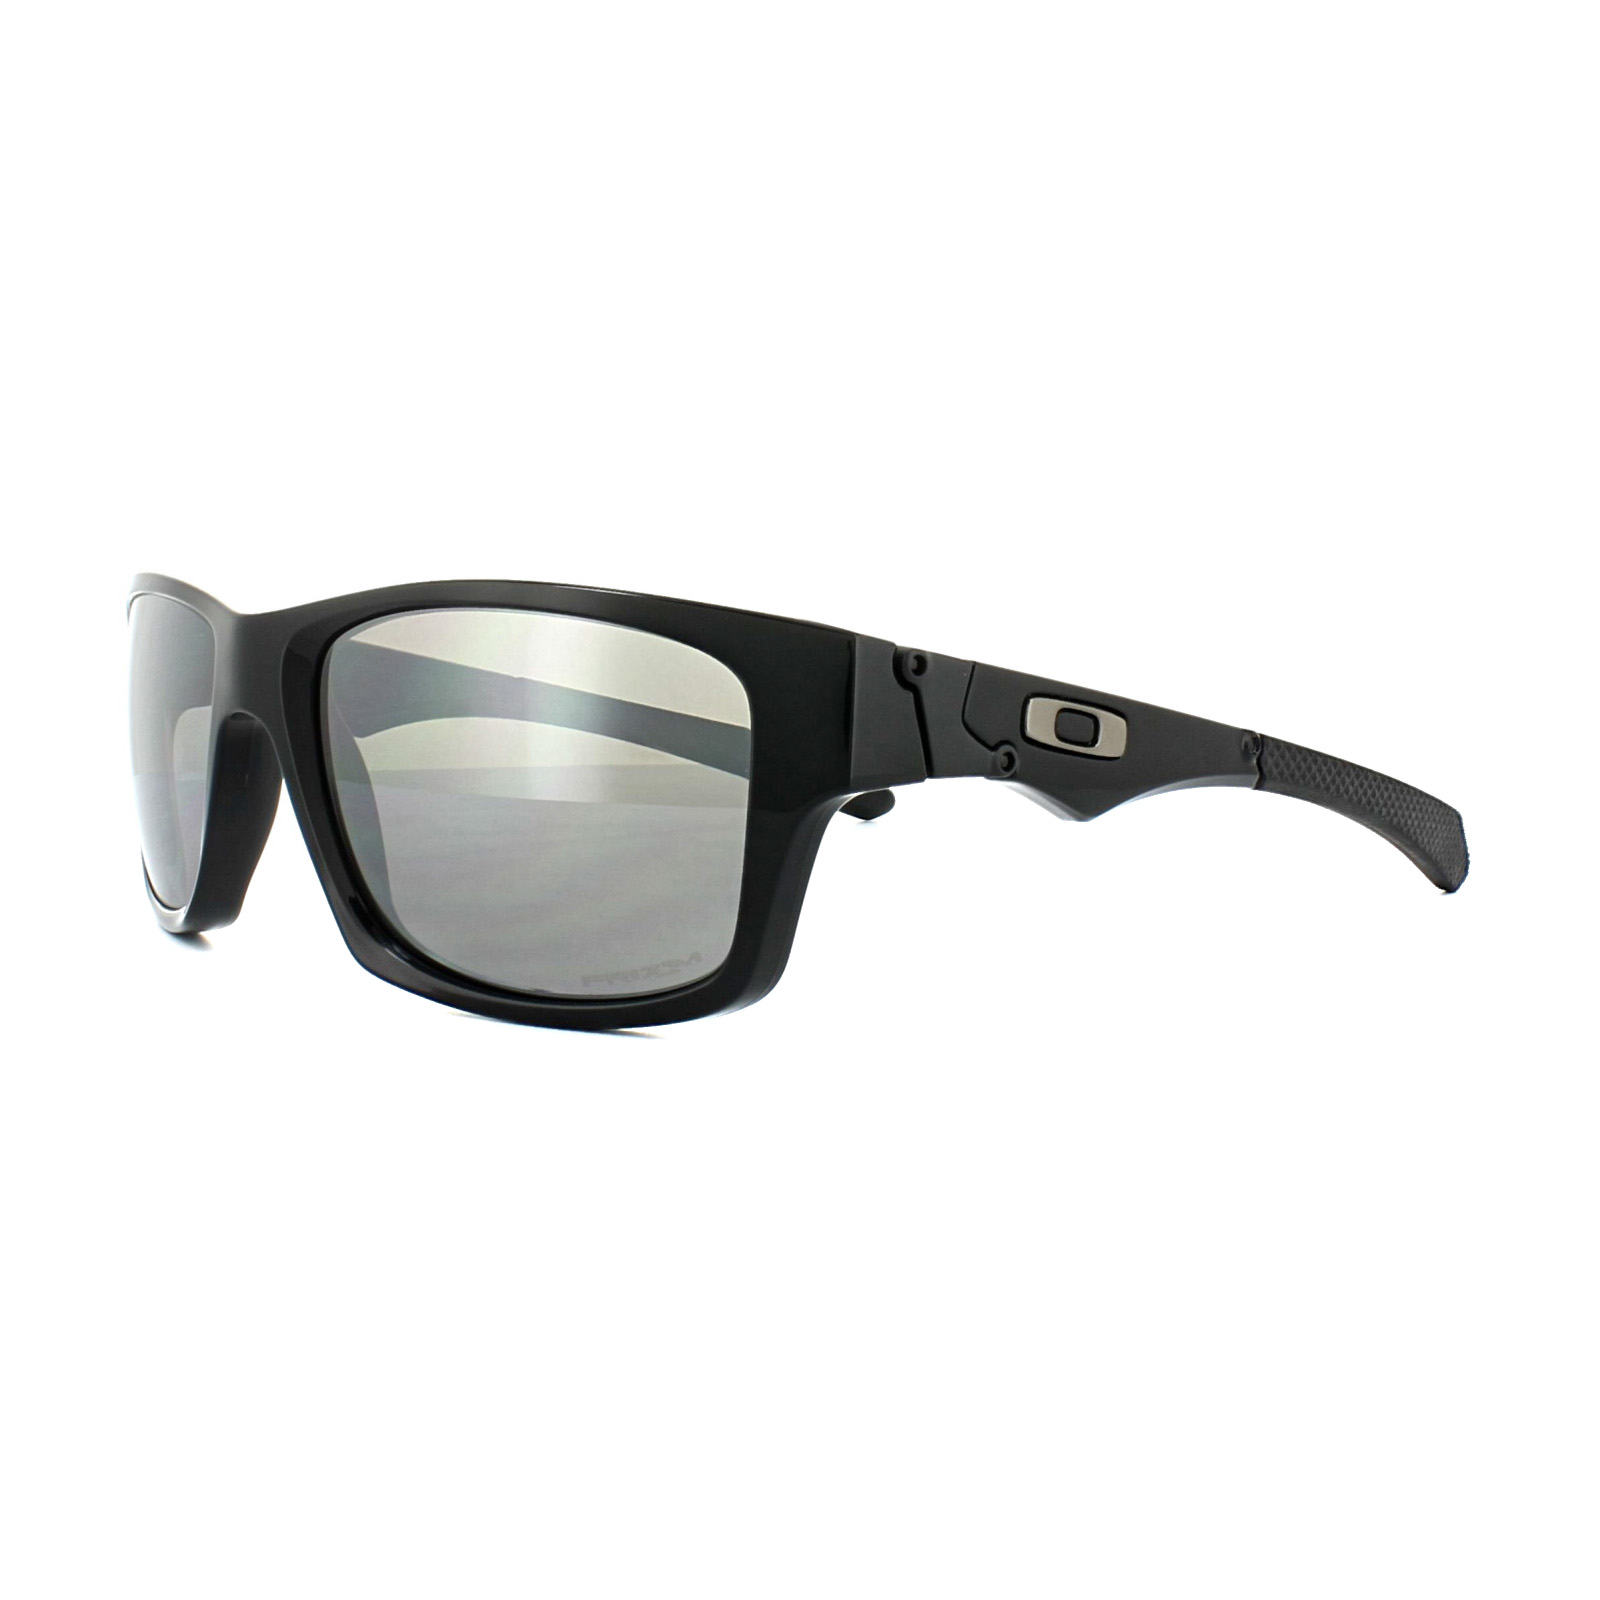 353dc2941f Sentinel Oakley Sunglasses Jupiter Squared OO9135-29 Polished Black Prizm  Black Polarized